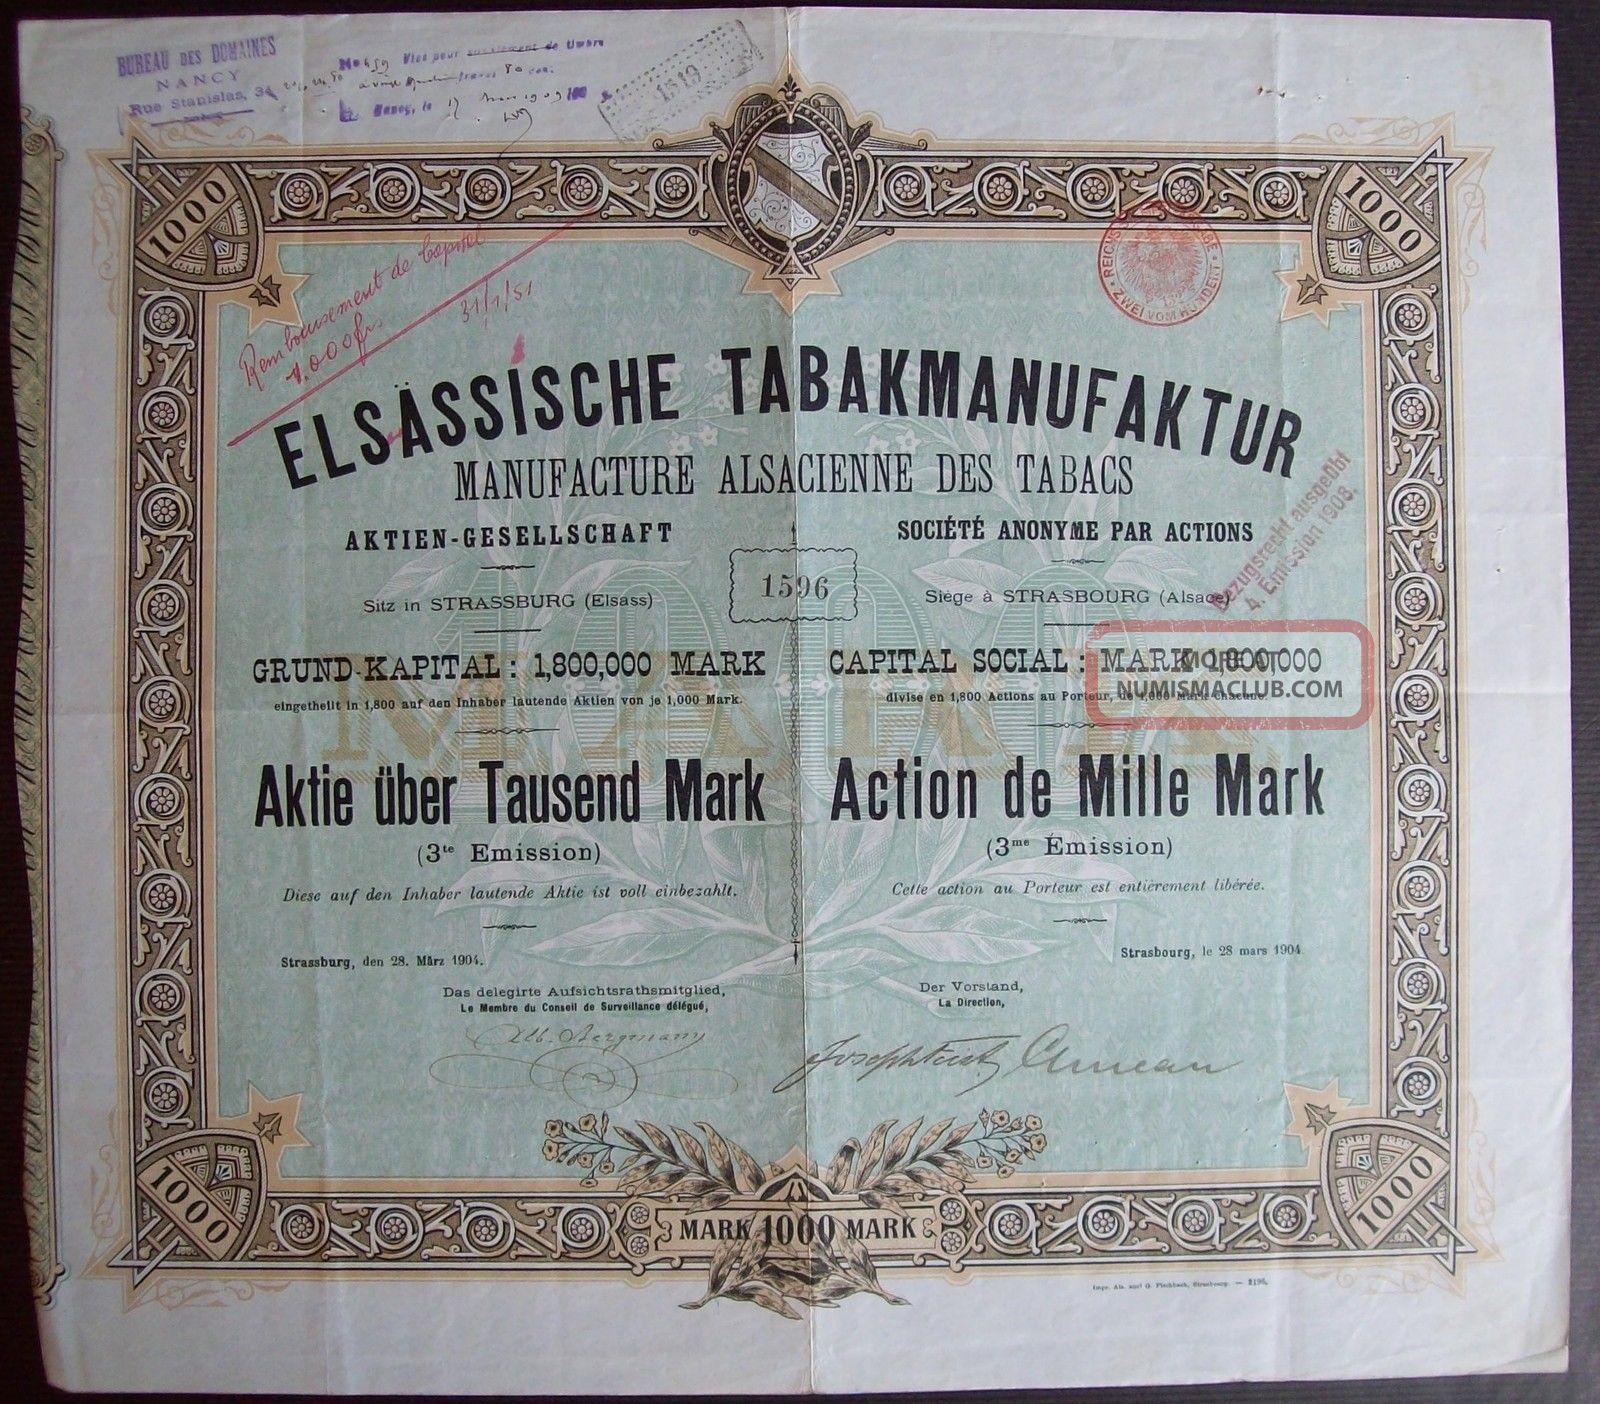 Germany 1904 Bond Certificate Elsassische Tabakmanufaktur Strasbourg.  B974 World photo